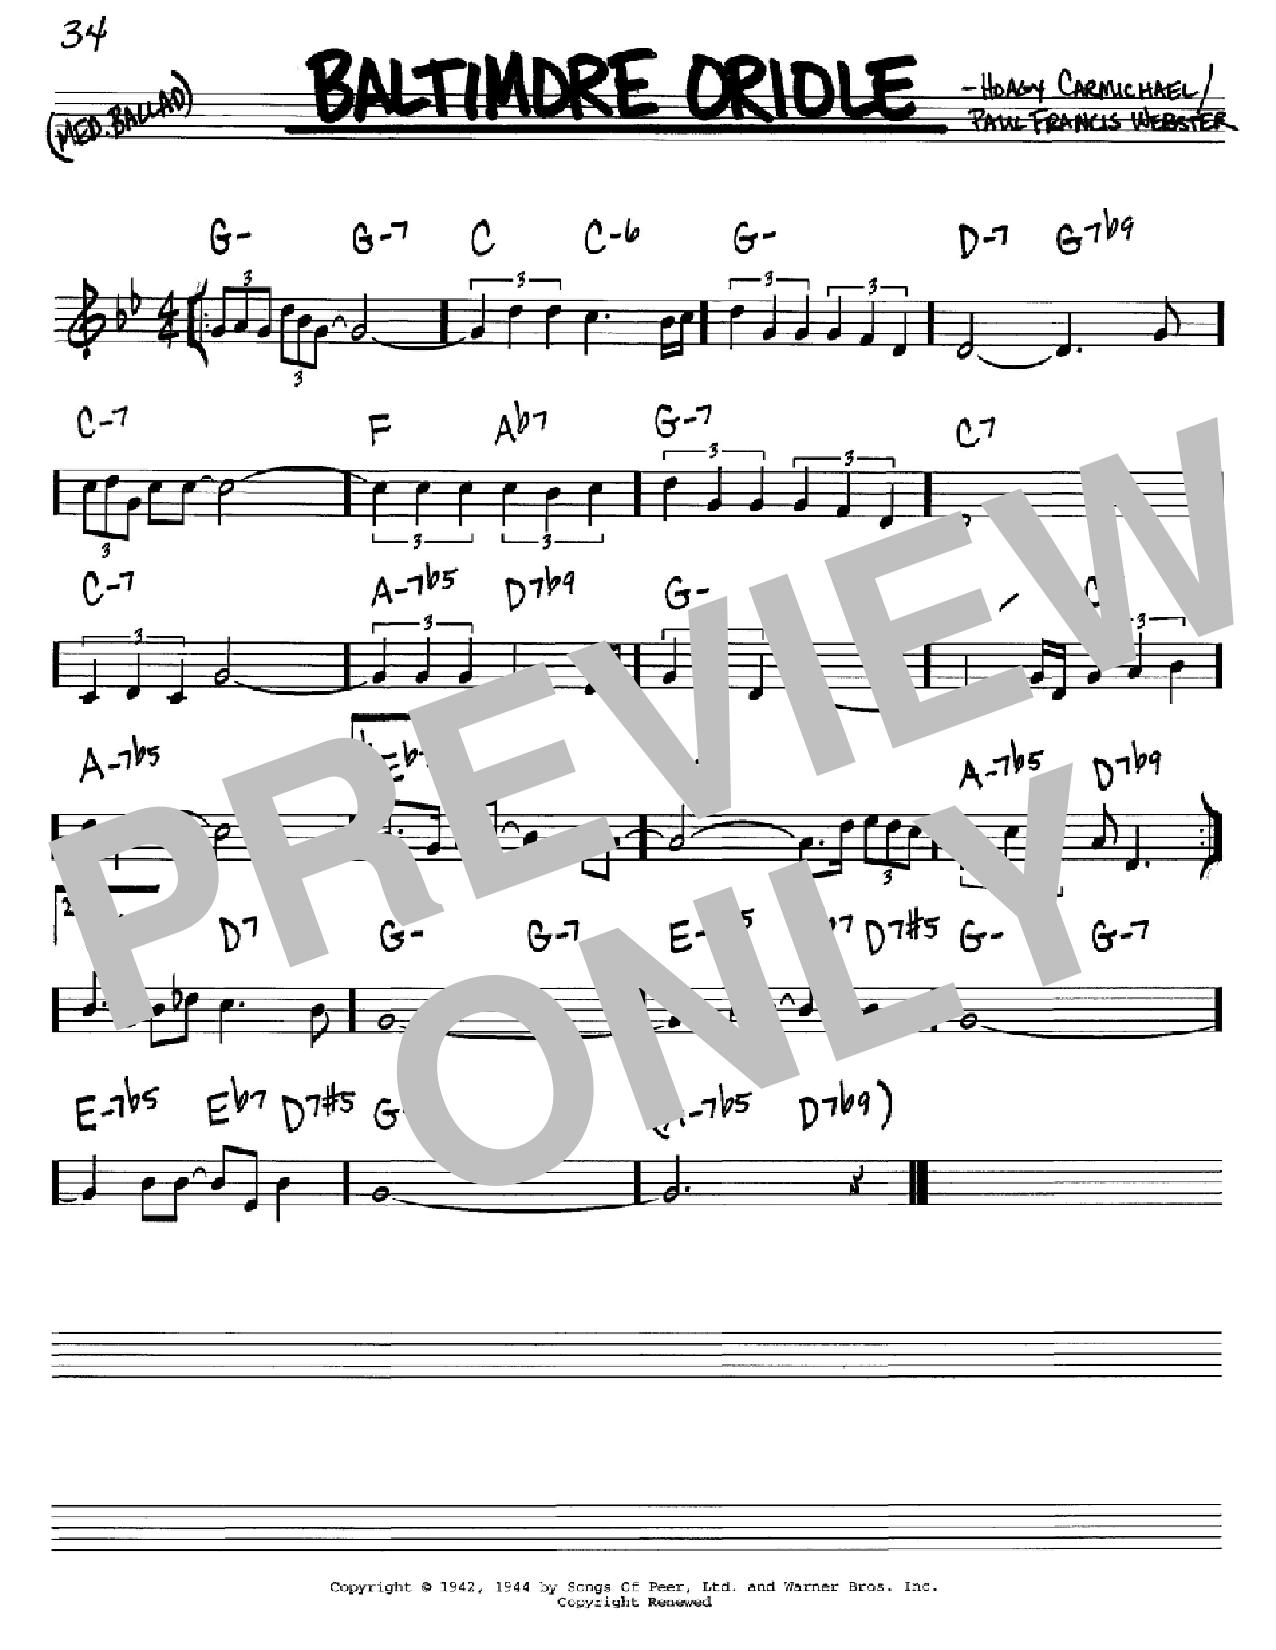 Baltimore Oriole Sheet Music